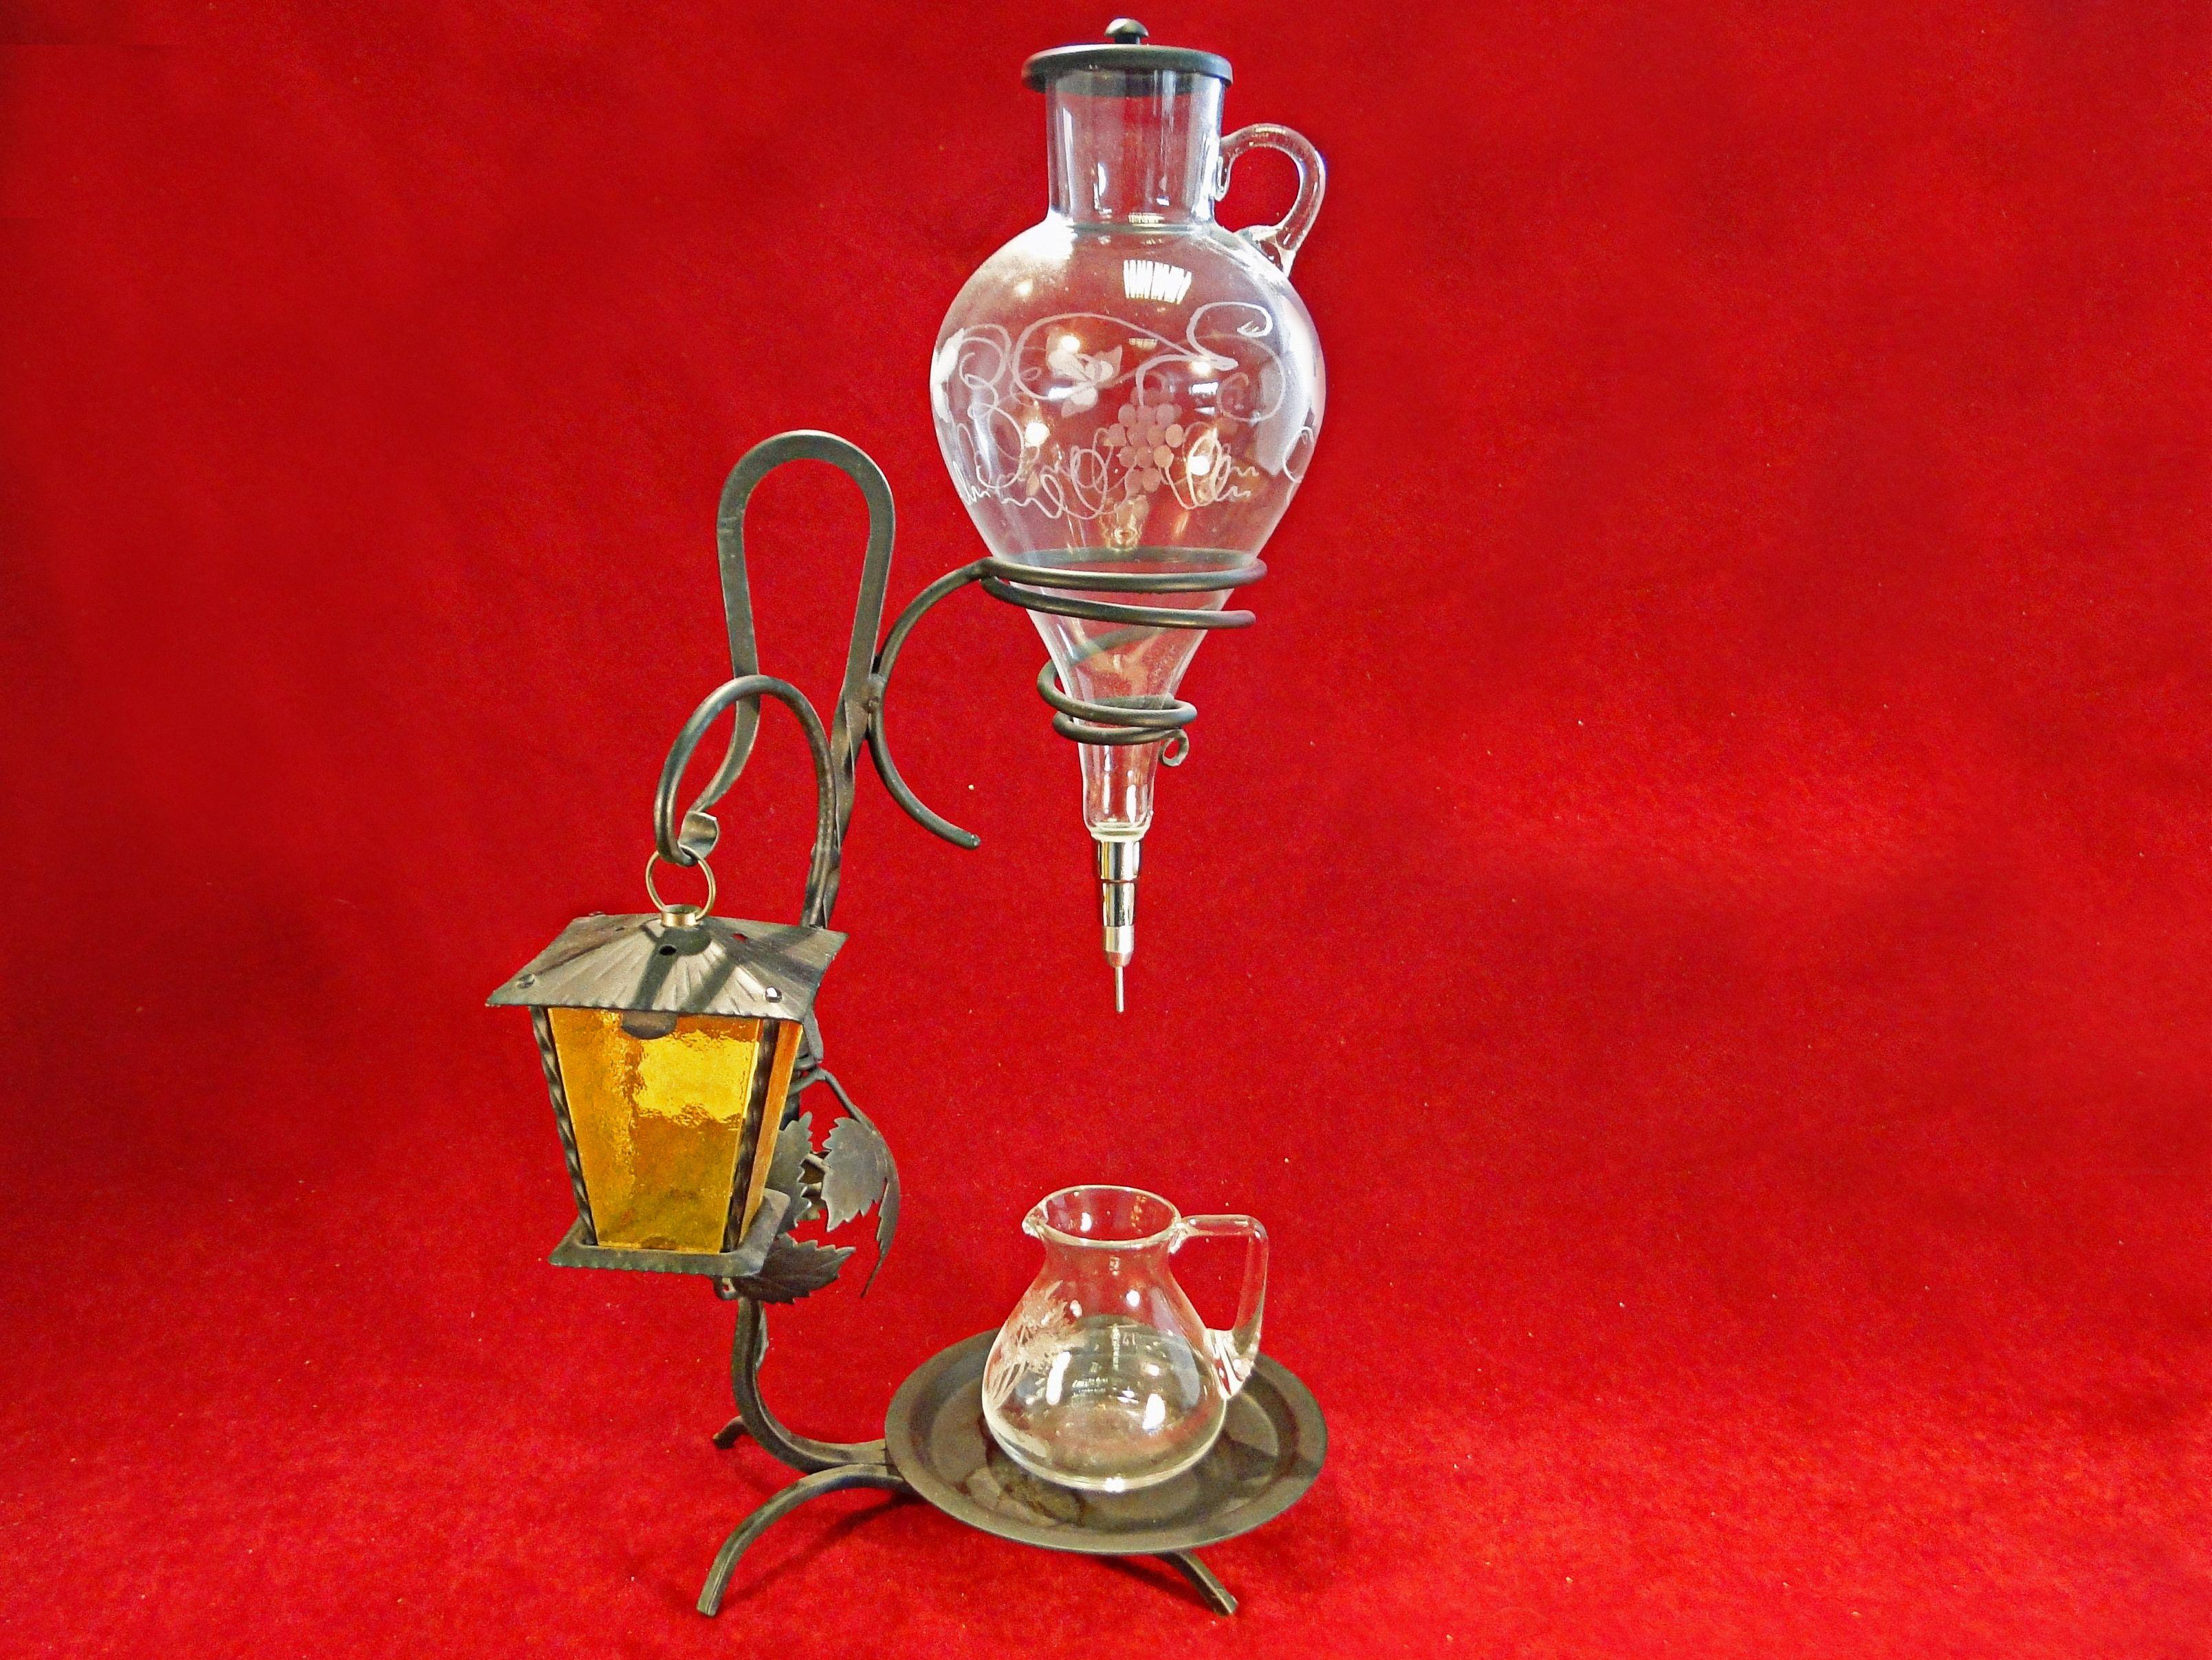 29 A Wacky Vintage Wrought Iron Wine Dispenser Est 15 25 Wine Dispenser Absinthe Fountain Wrought